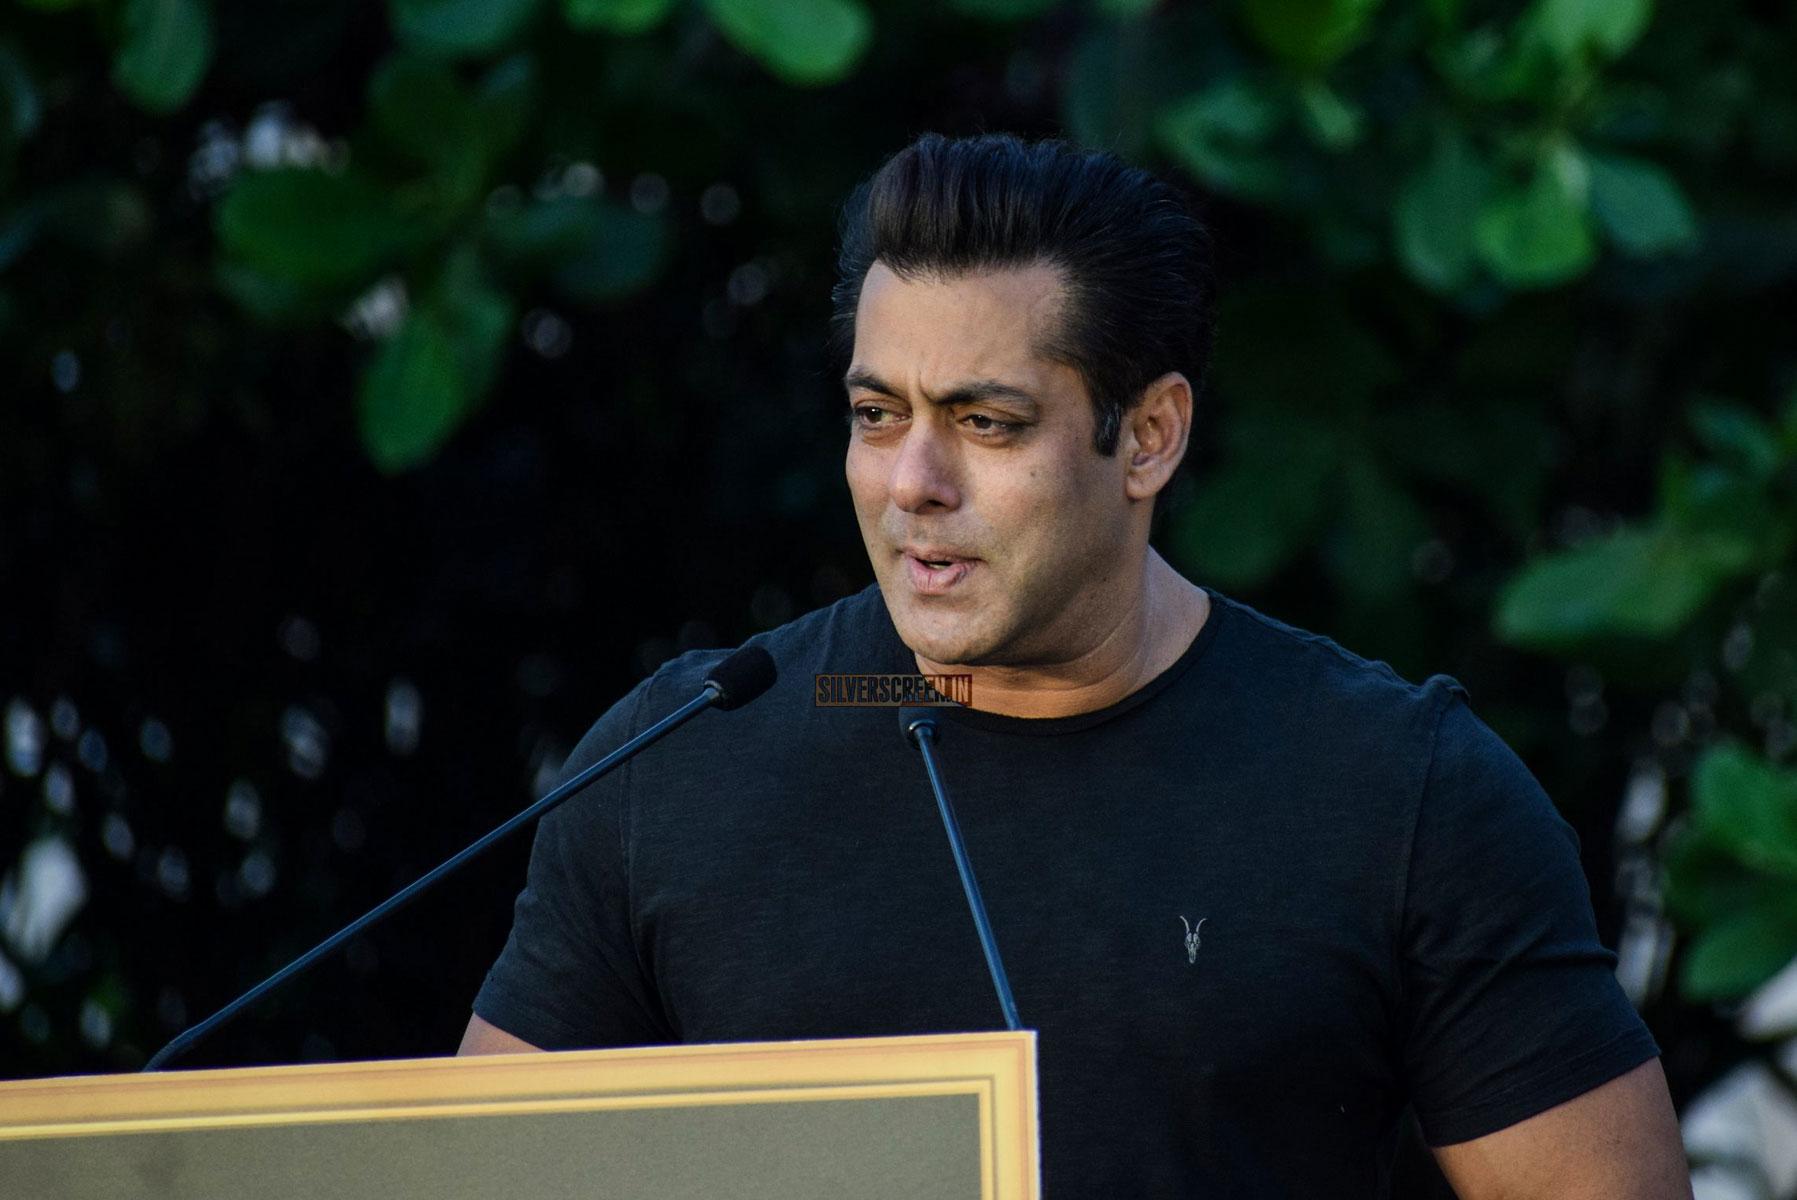 Salman Khan At Bina Kak's Book Launch